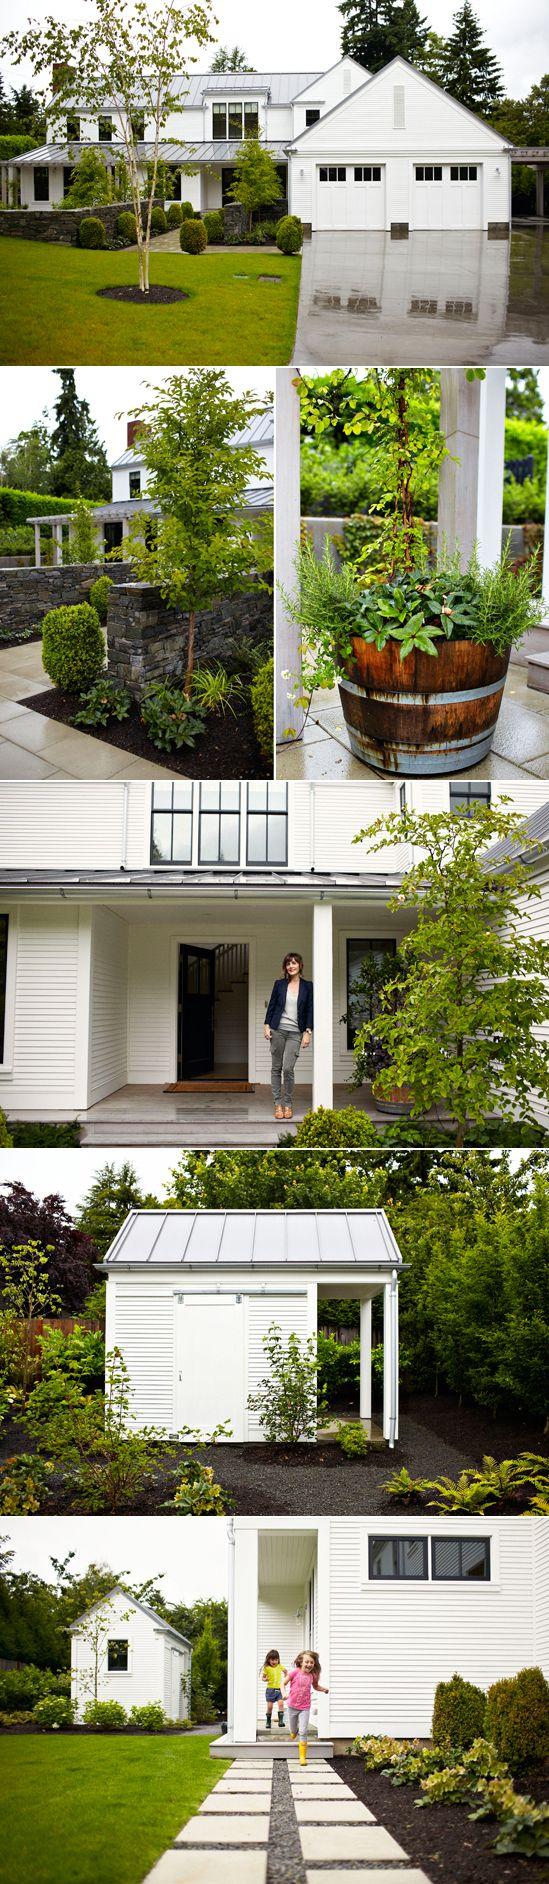 2013-06-26_modern farmhouse medina_1.jpg